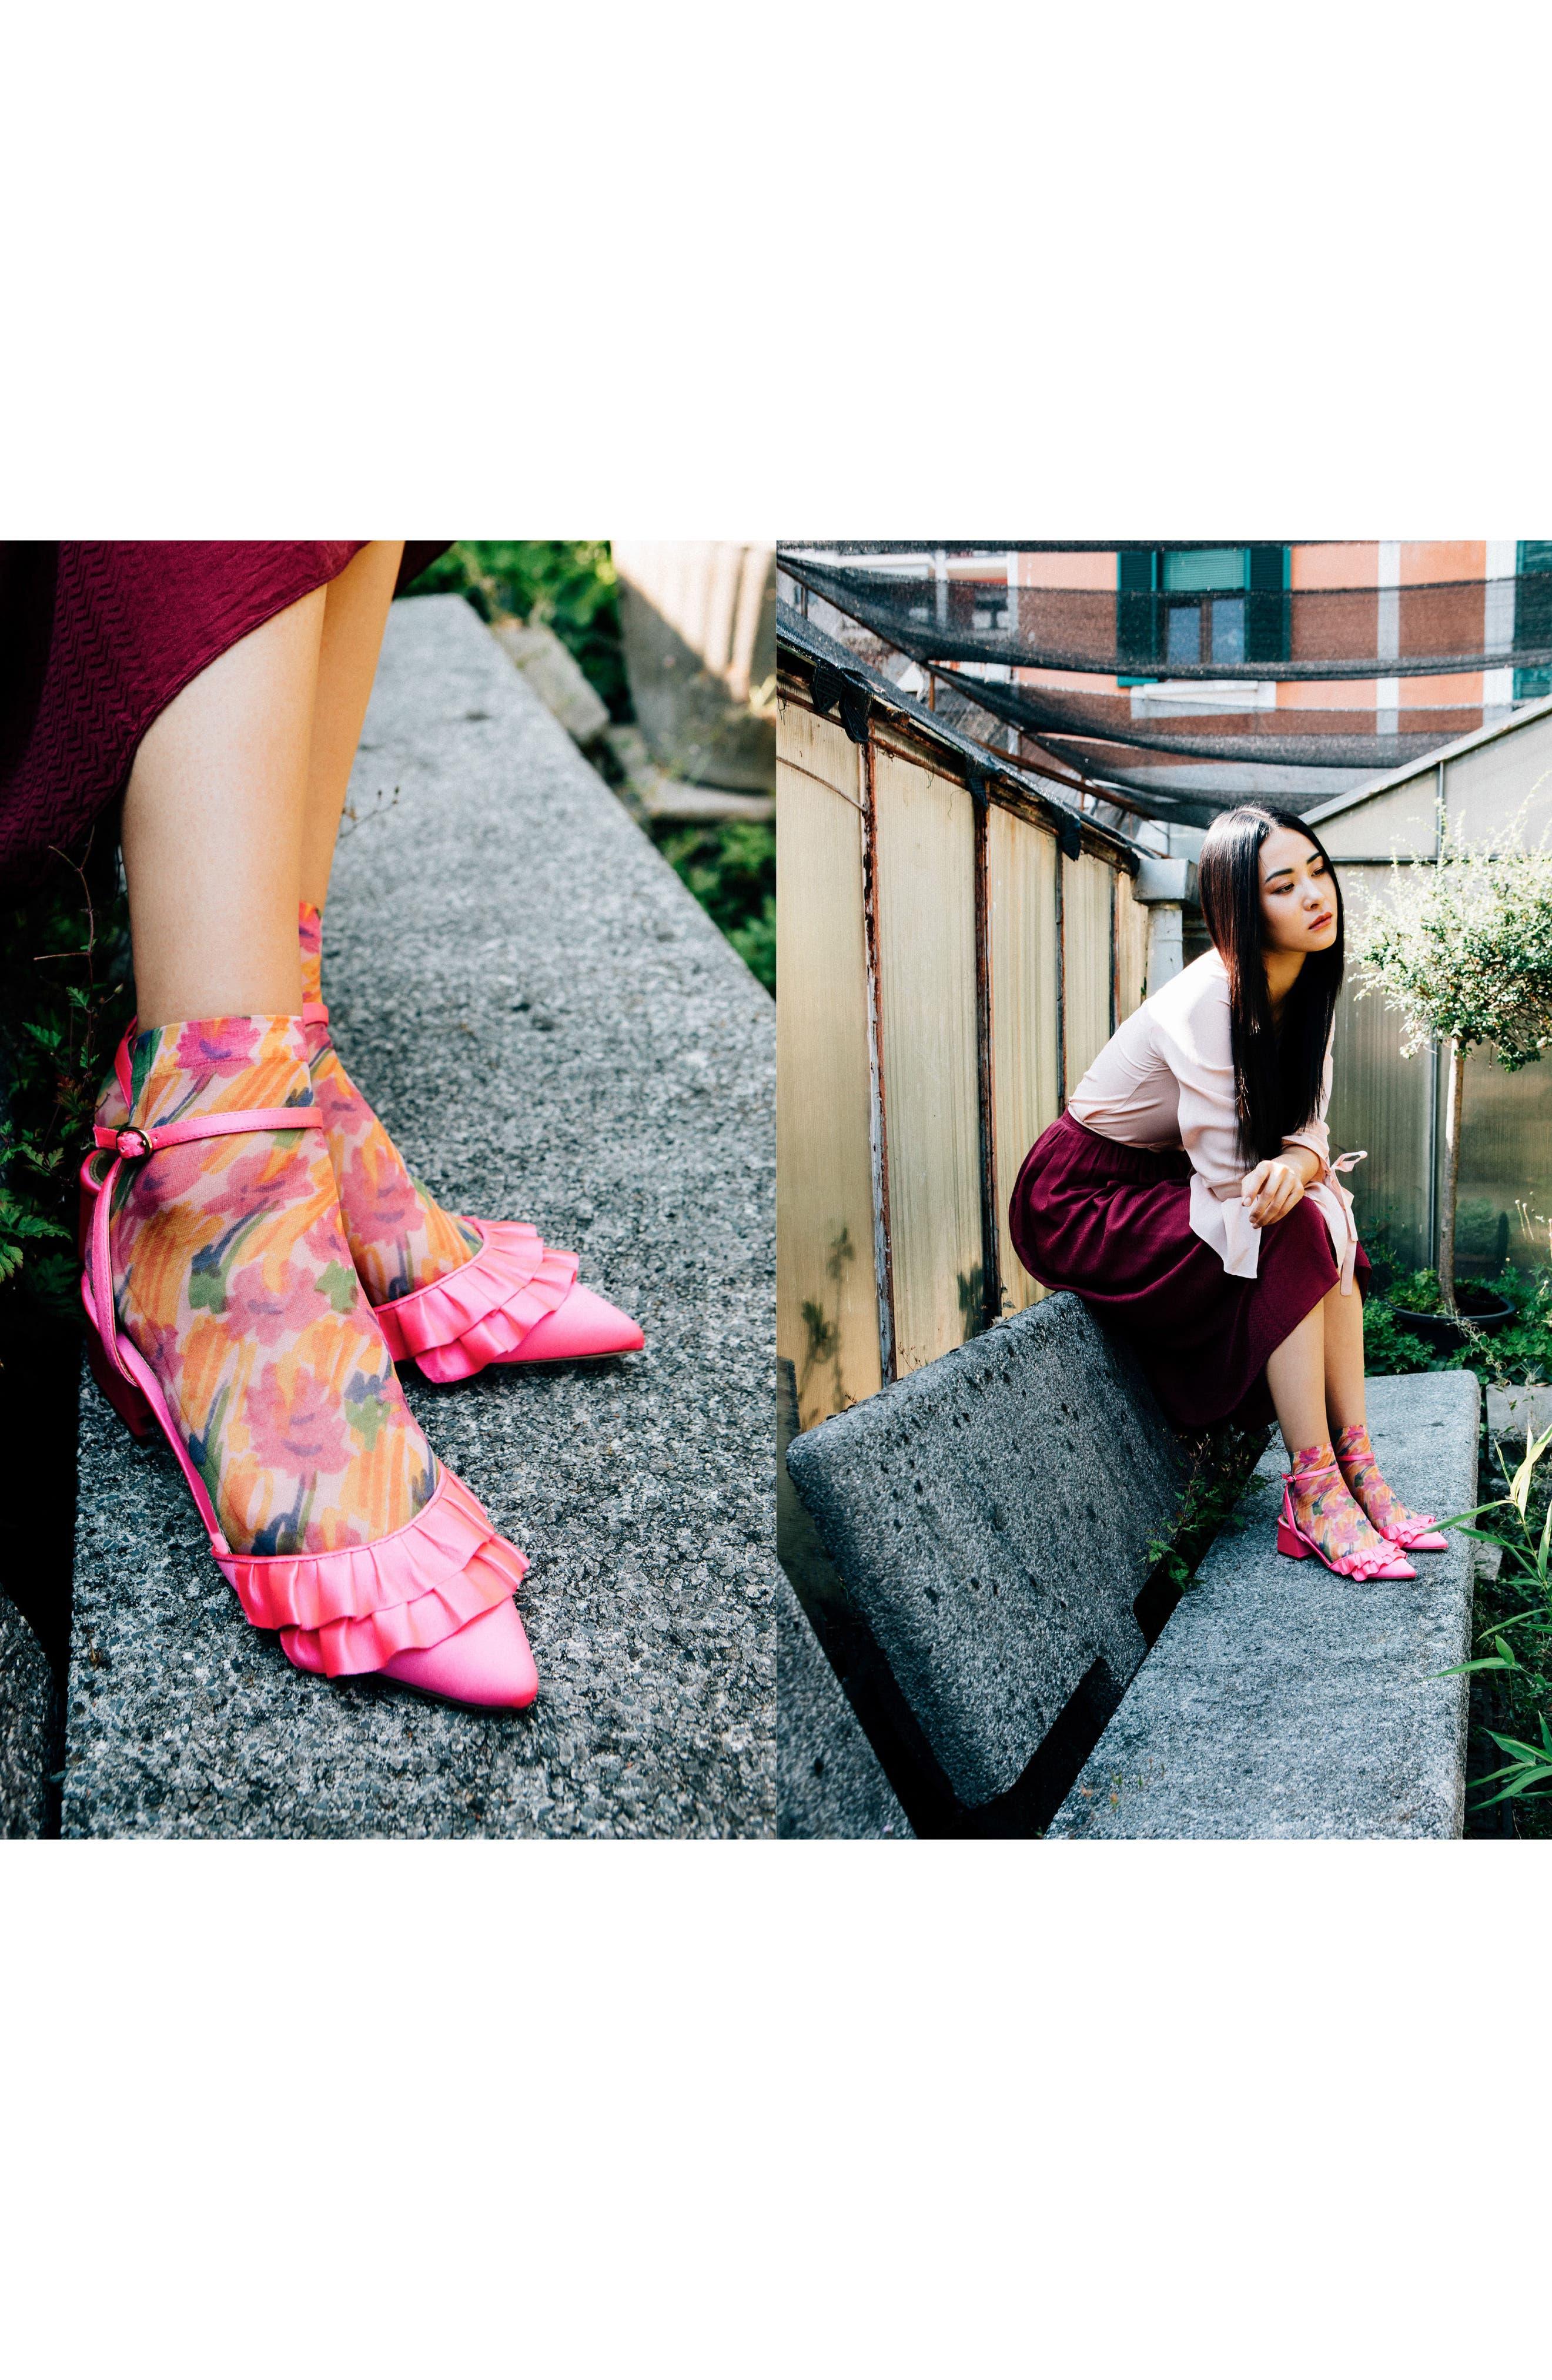 Benedetta Ankle Socks,                             Alternate thumbnail 4, color,                             Fiore Astratto